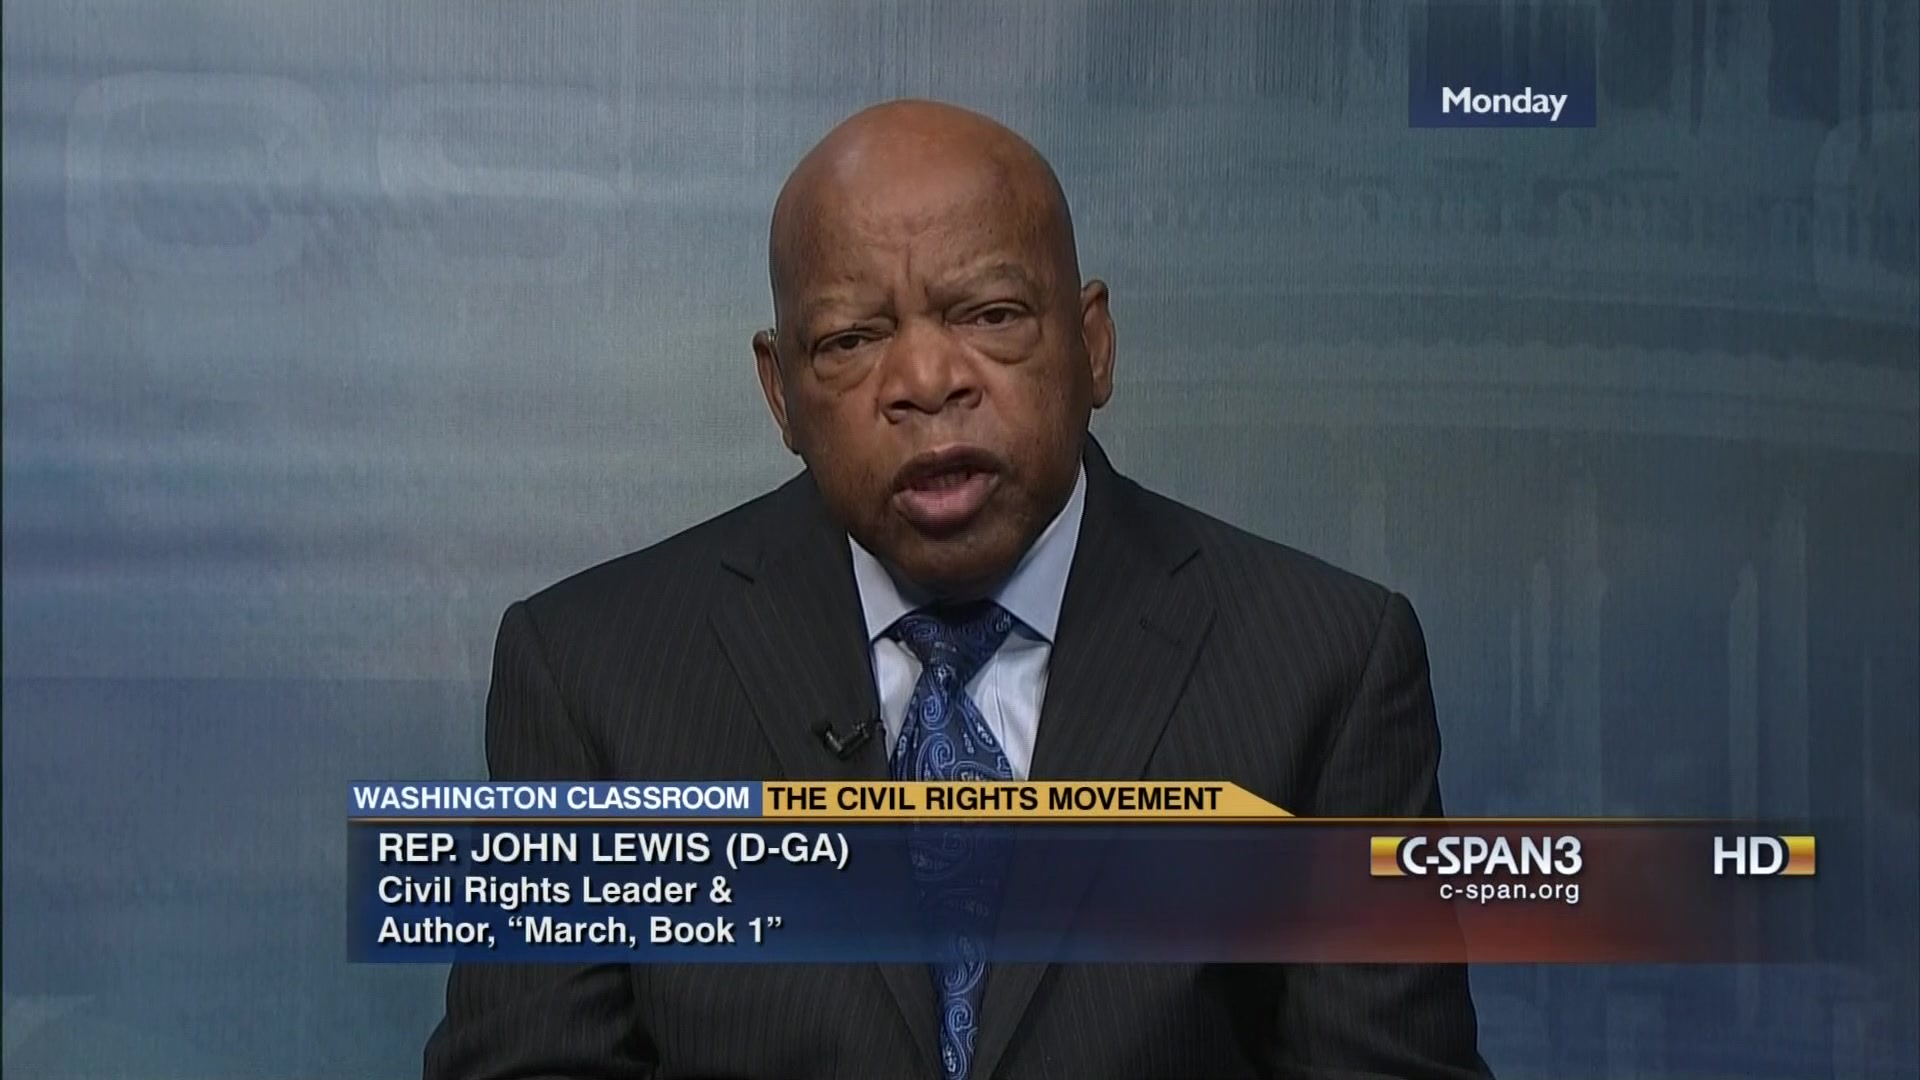 Rep John Lewis Reflects Civil Rights Movement Dec 2 2013 Video